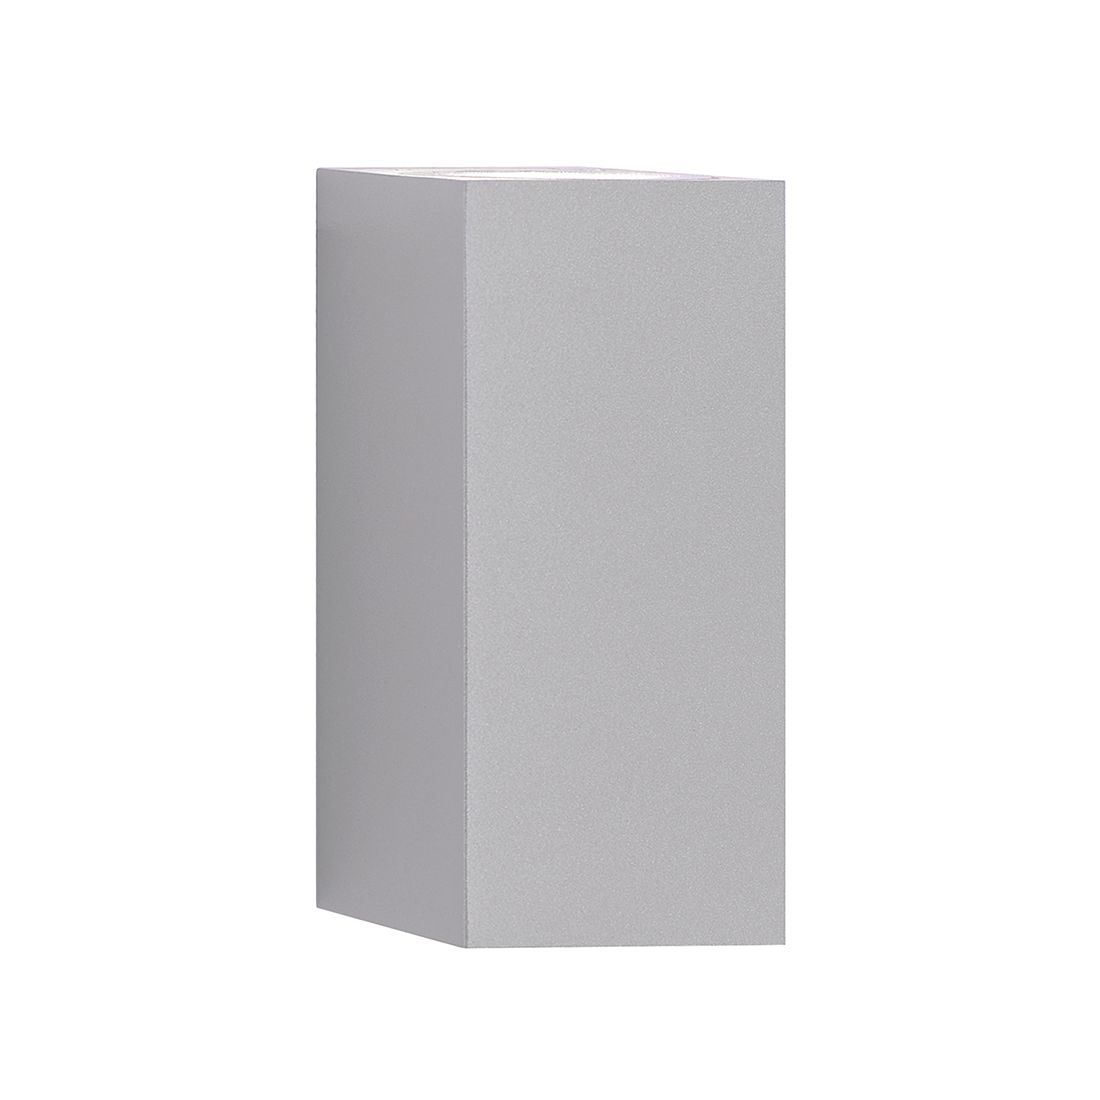 LED-Wandleuchte Nemerow ● Aluminium ● Grau- FLI Leuchten A+